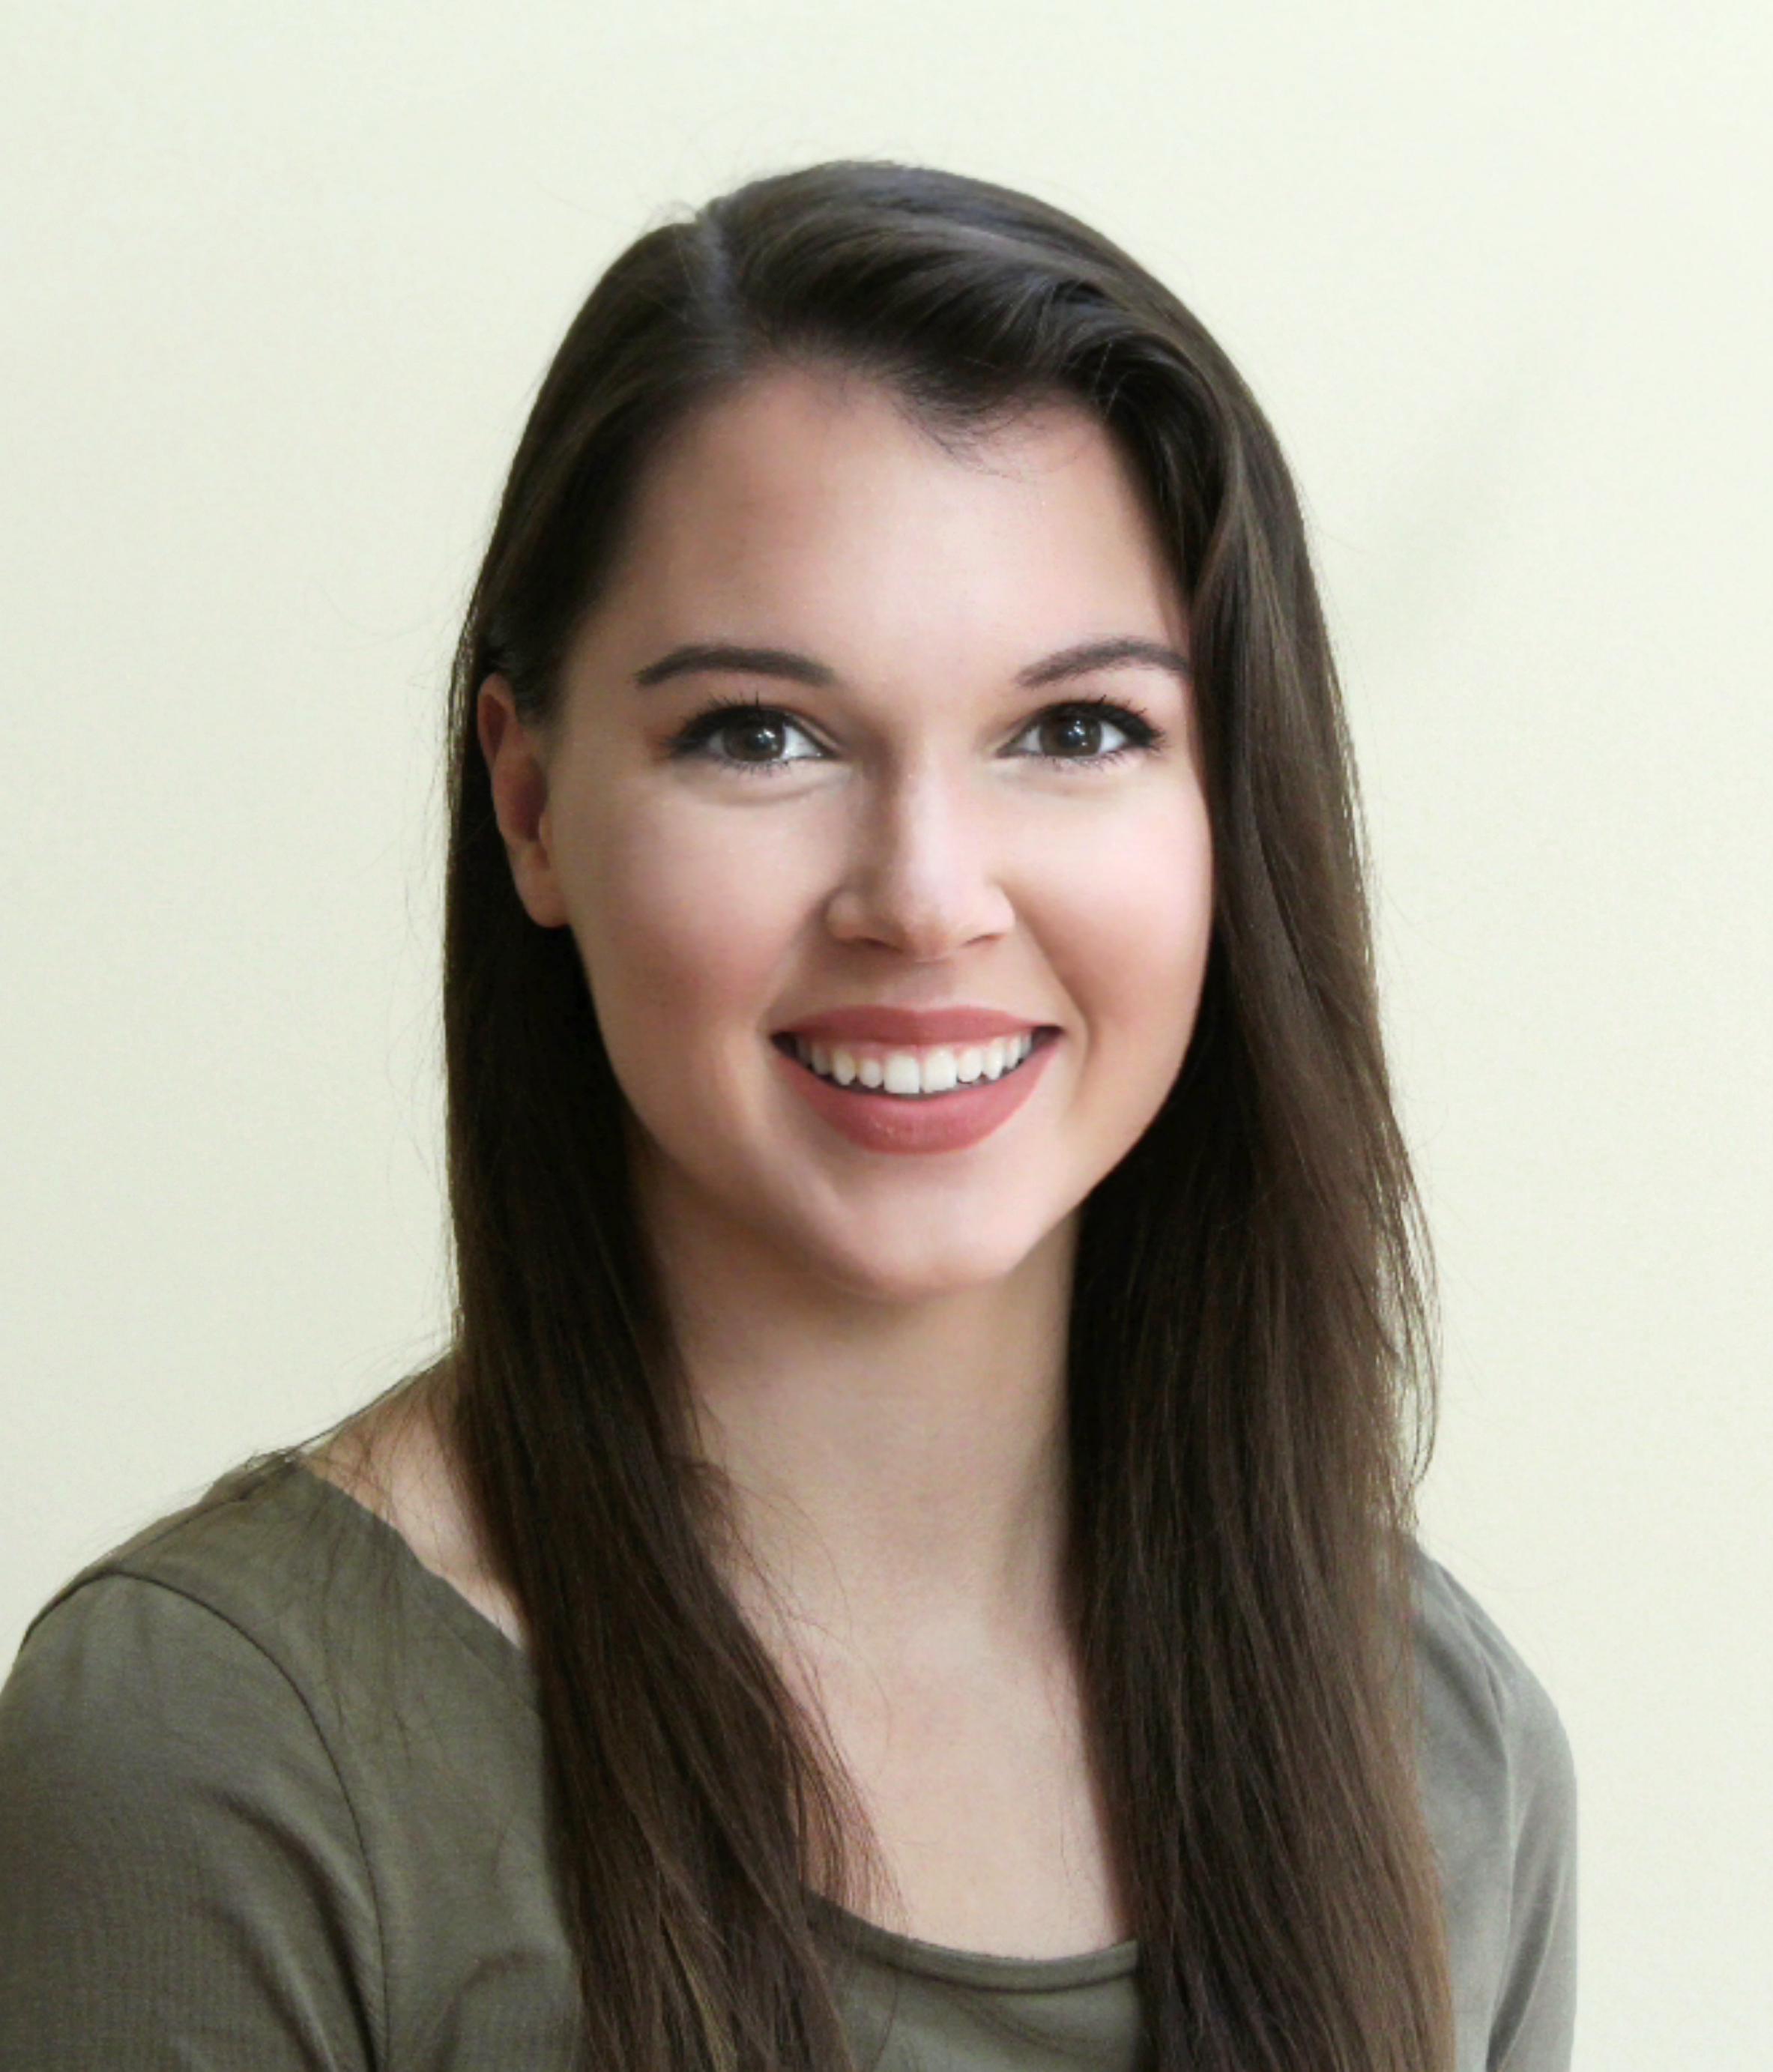 Nicole Mair Headshot.jpg